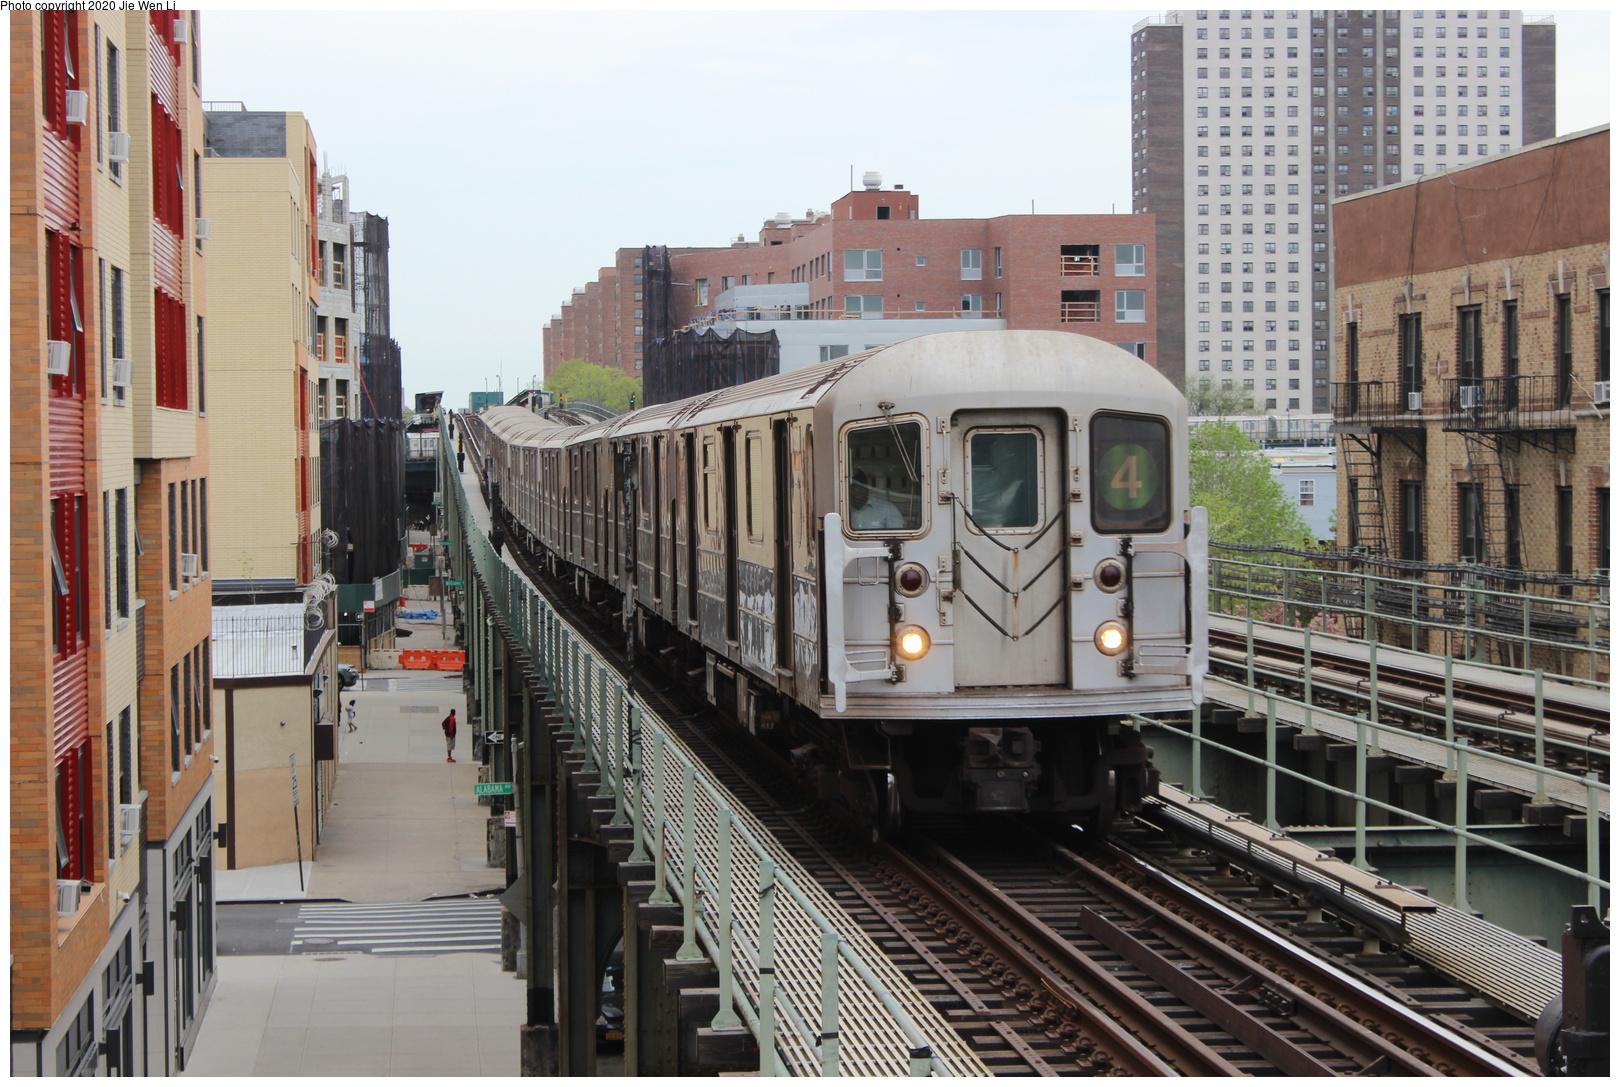 (722k, 1620x1087)<br><b>Country:</b> United States<br><b>City:</b> New York<br><b>System:</b> New York City Transit<br><b>Line:</b> IRT Brooklyn Line<br><b>Location:</b> Pennsylvania Avenue<br><b>Route:</b> 4<br><b>Car:</b> R-62 (Kawasaki, 1983-1985) 1581 <br><b>Photo by:</b> Jie Wen Li<br><b>Date:</b> 5/5/2018<br><b>Viewed (this week/total):</b> 3 / 398